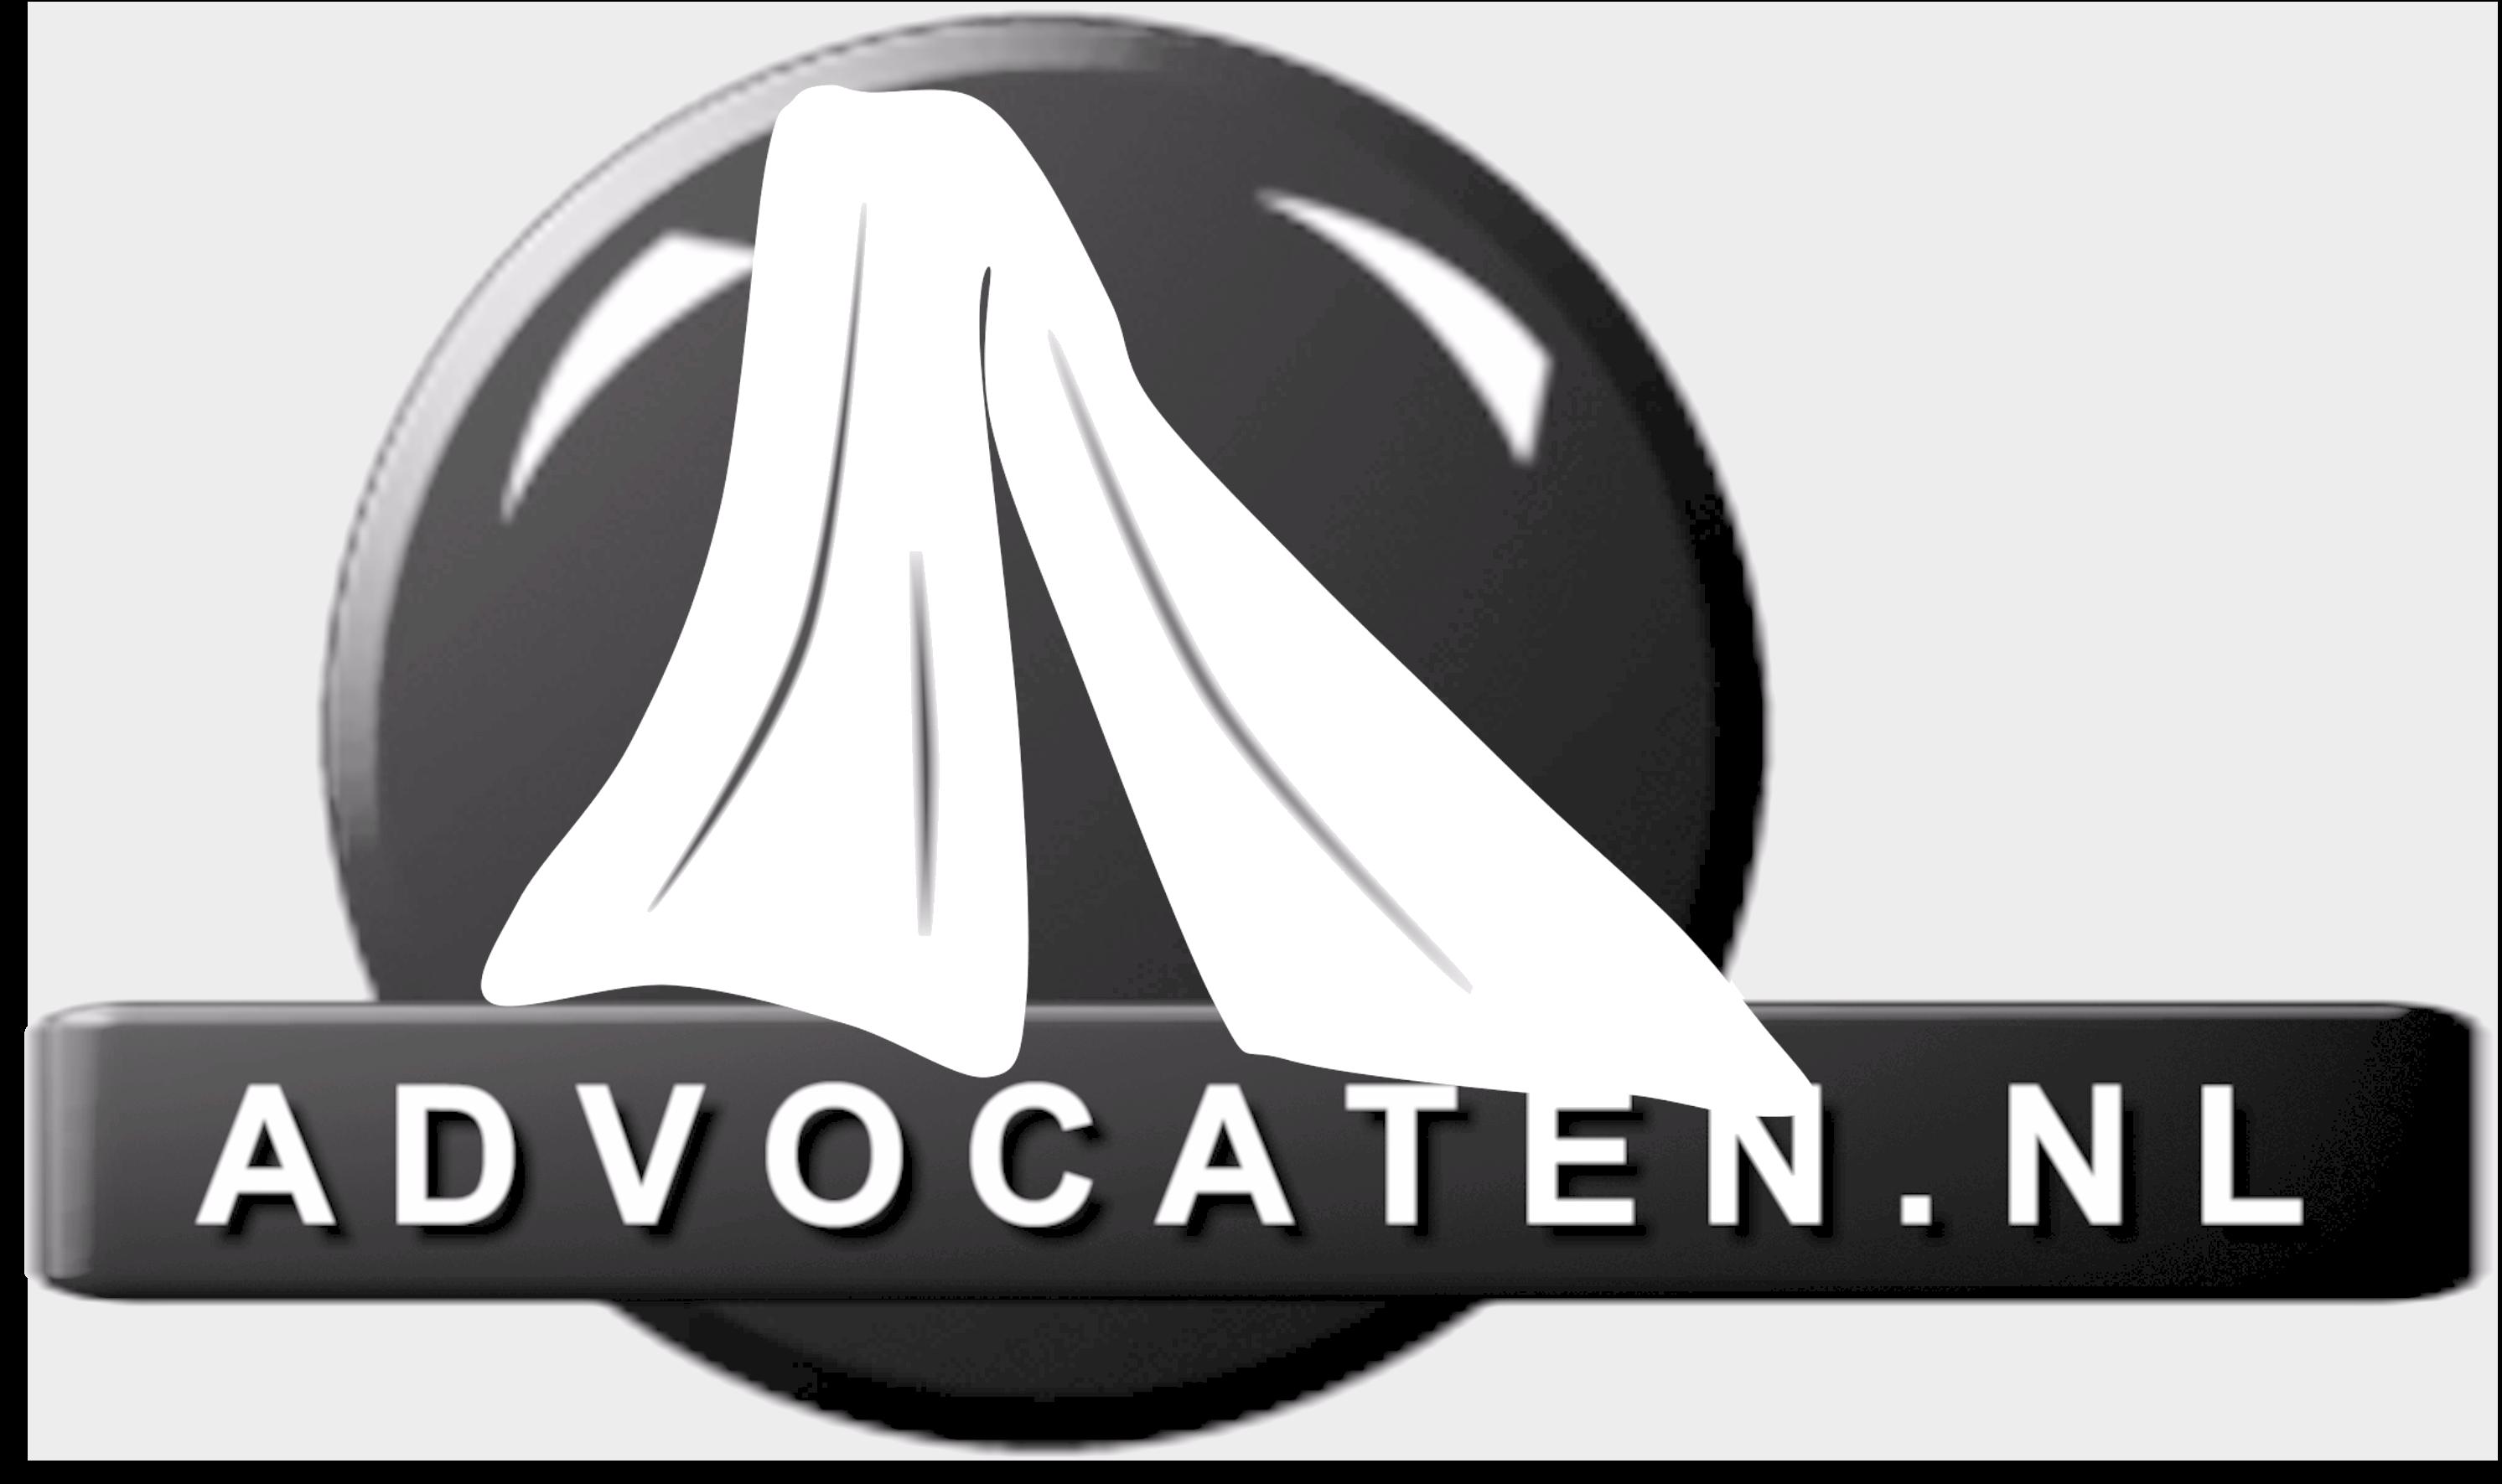 advocaten.nl